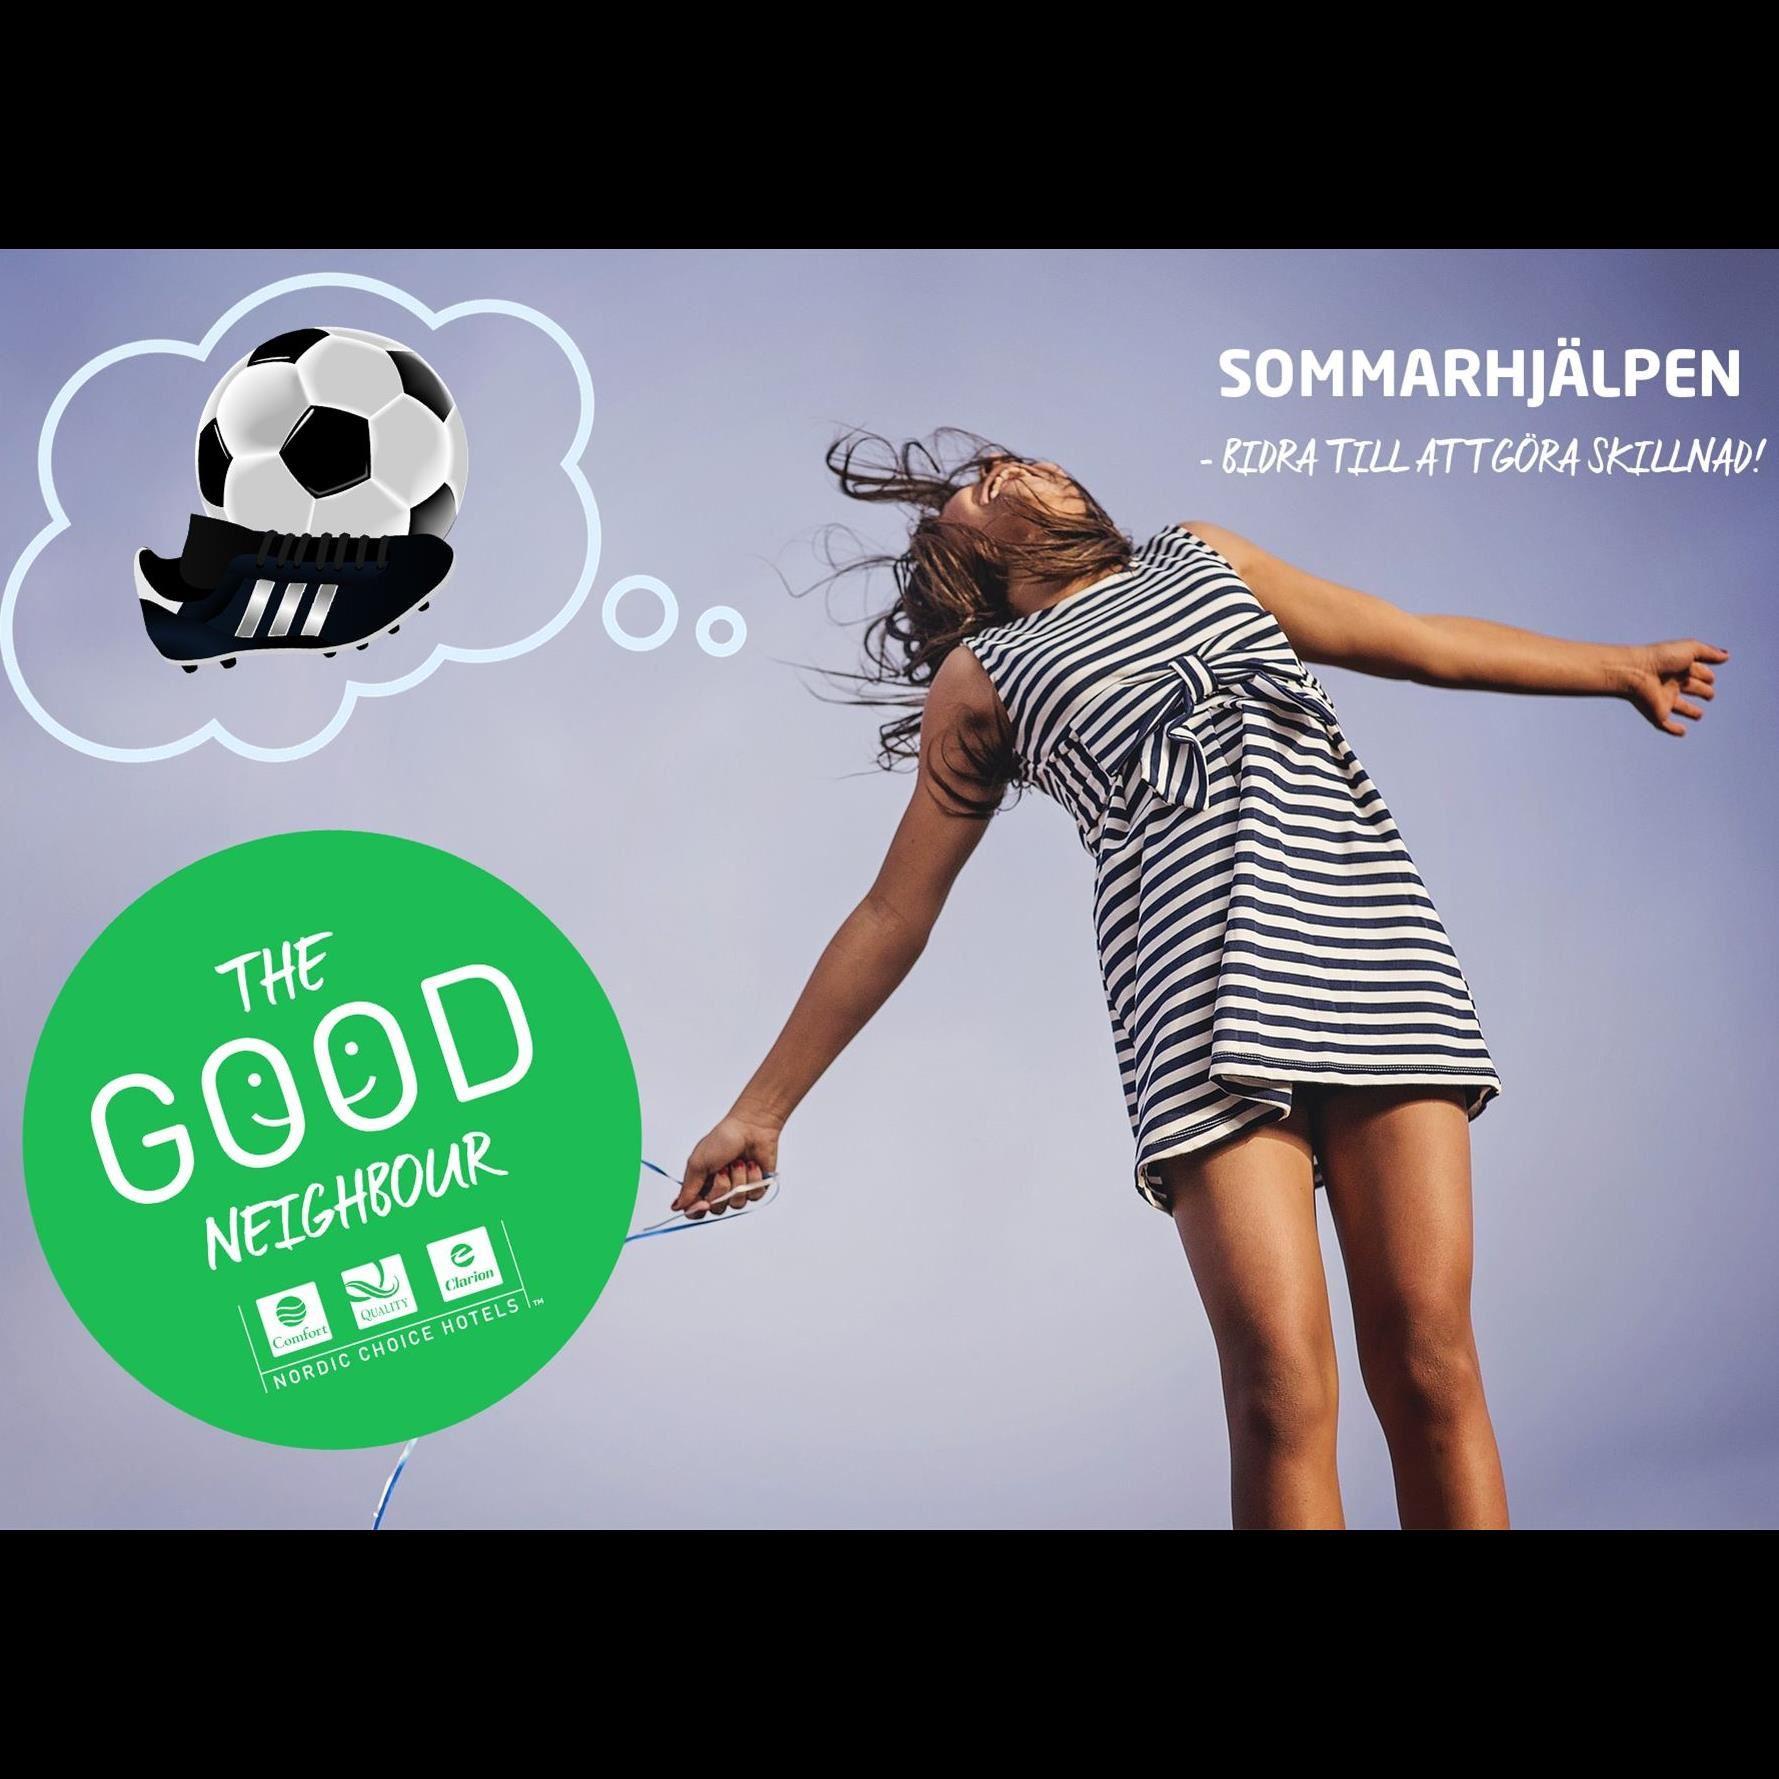 Quality Hotel Sundsvall - Sommarhjälpen!